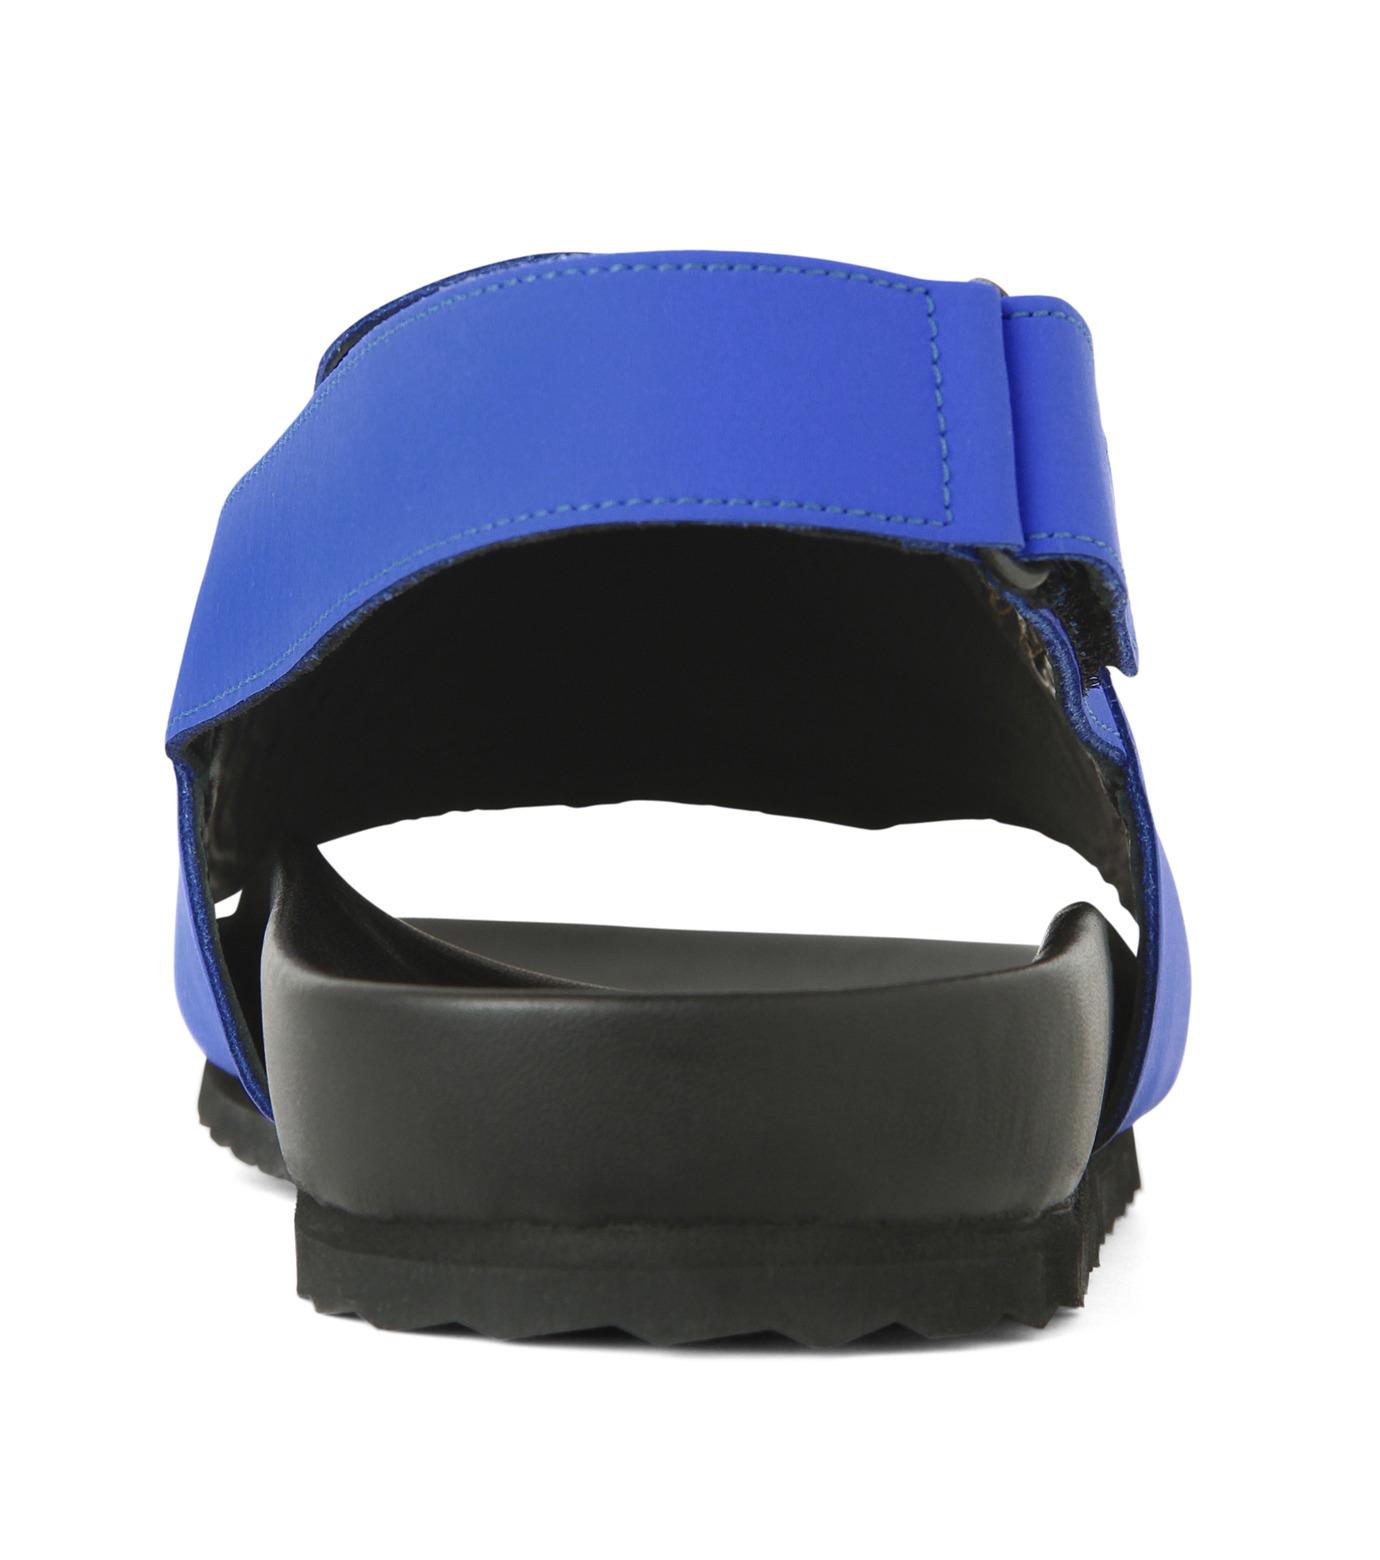 Pierre Hardy(ピエール アルディ)のGumcalf Sandal-LIGHT BLUE(シューズ/shoes)-S5HY07GUM-T-91 拡大詳細画像2